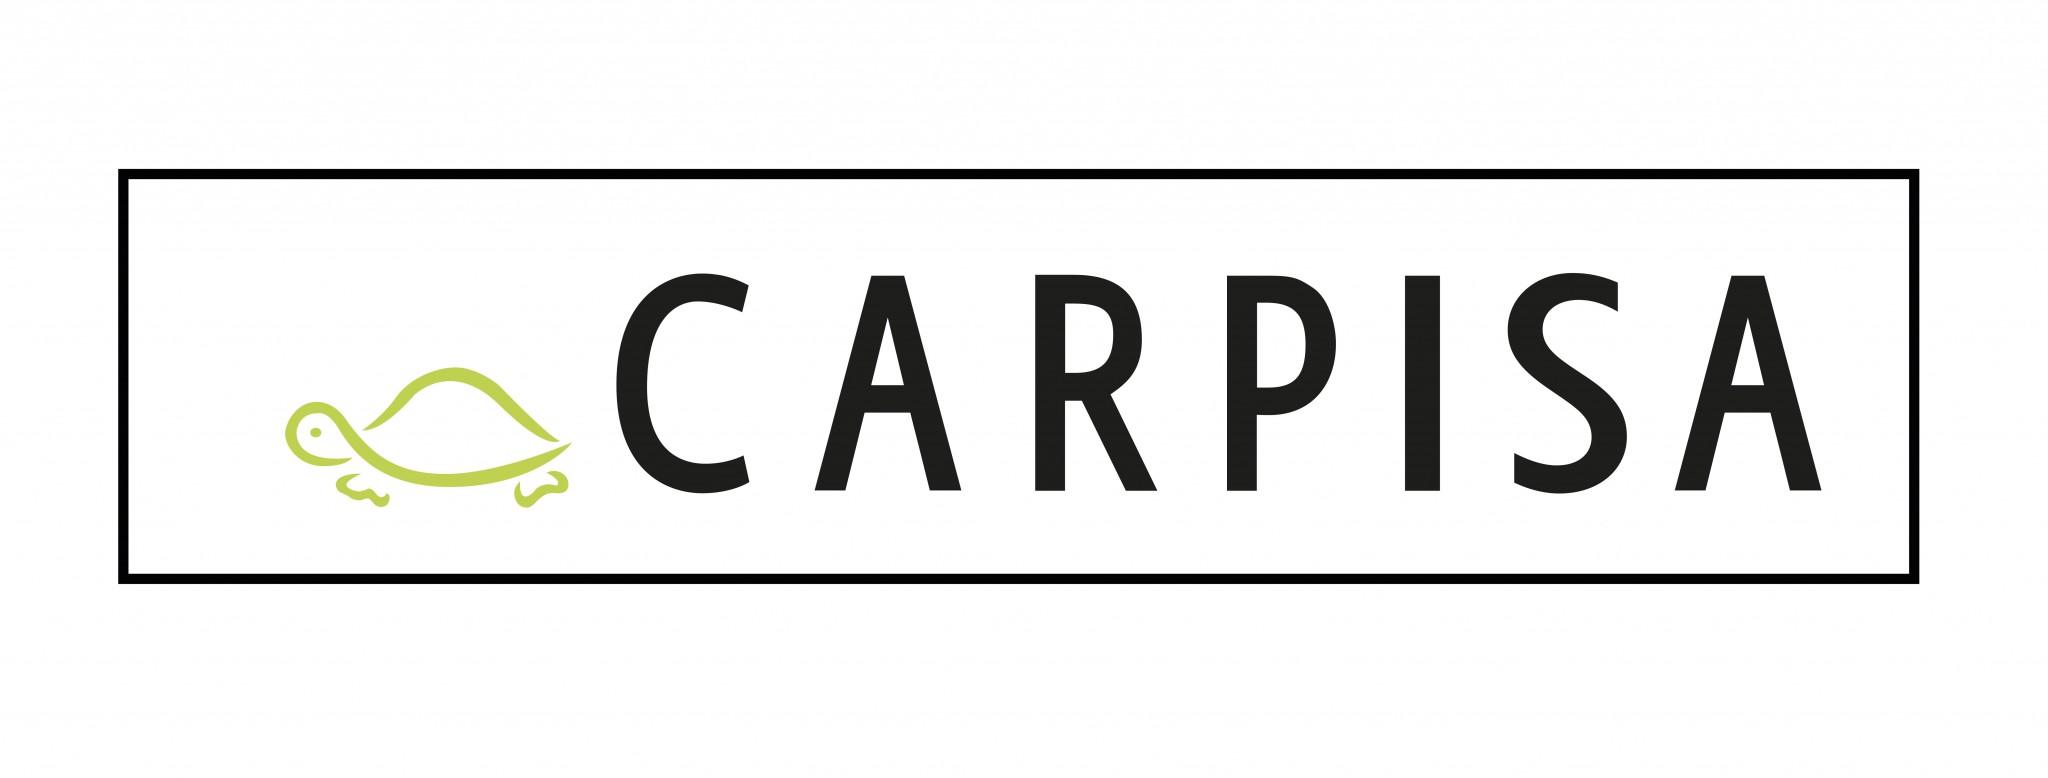 carpisa-logo